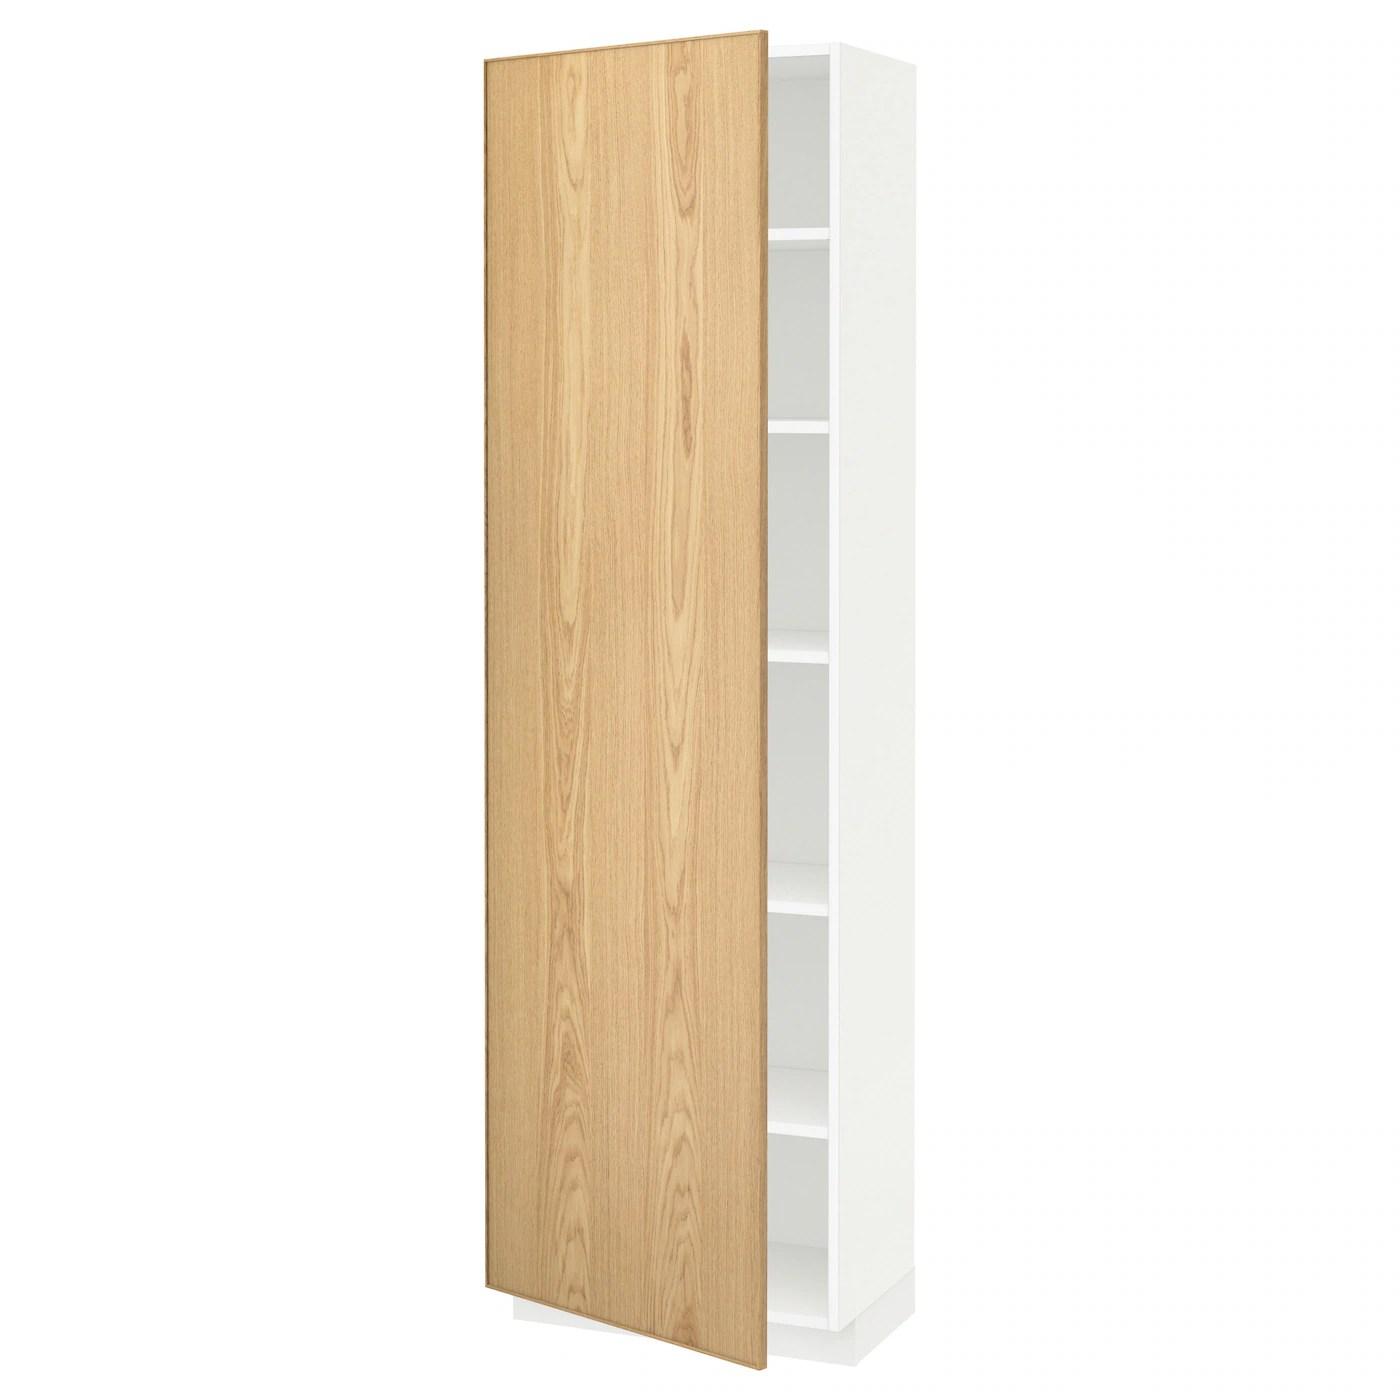 Smalle Witte Kast.Hoog Smal Kastje Cabinets Product Categories Piet Hein Eek